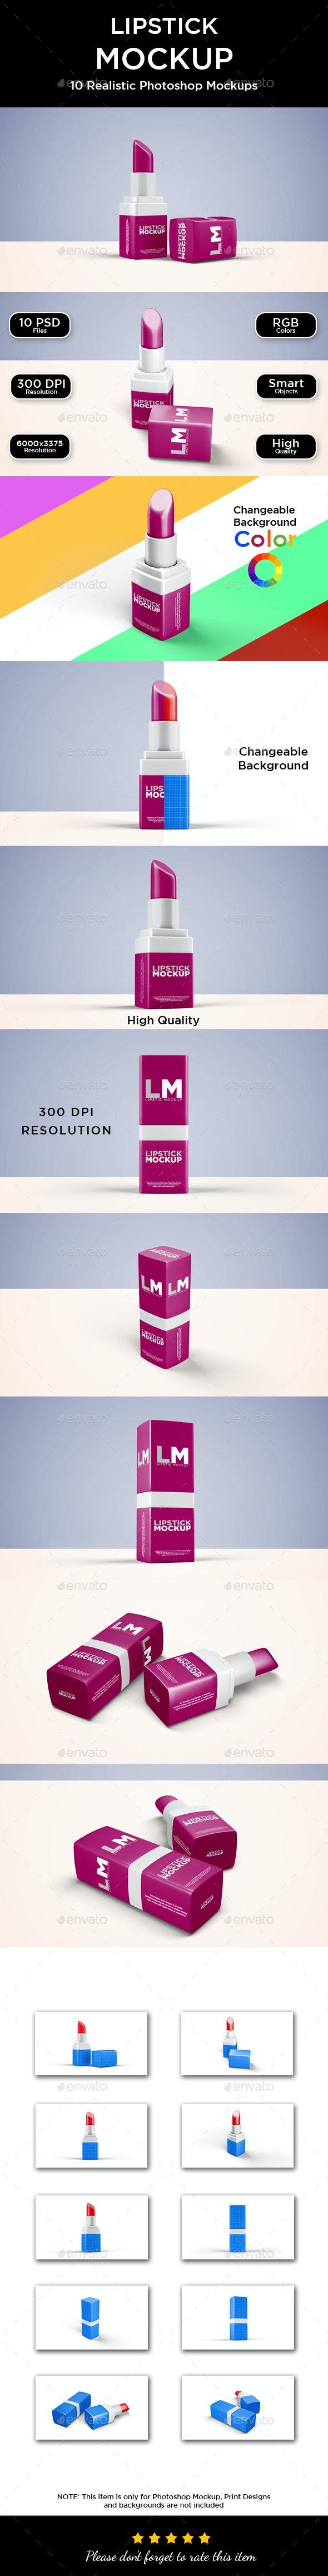 Lipstick Mockup - Beauty Packaging